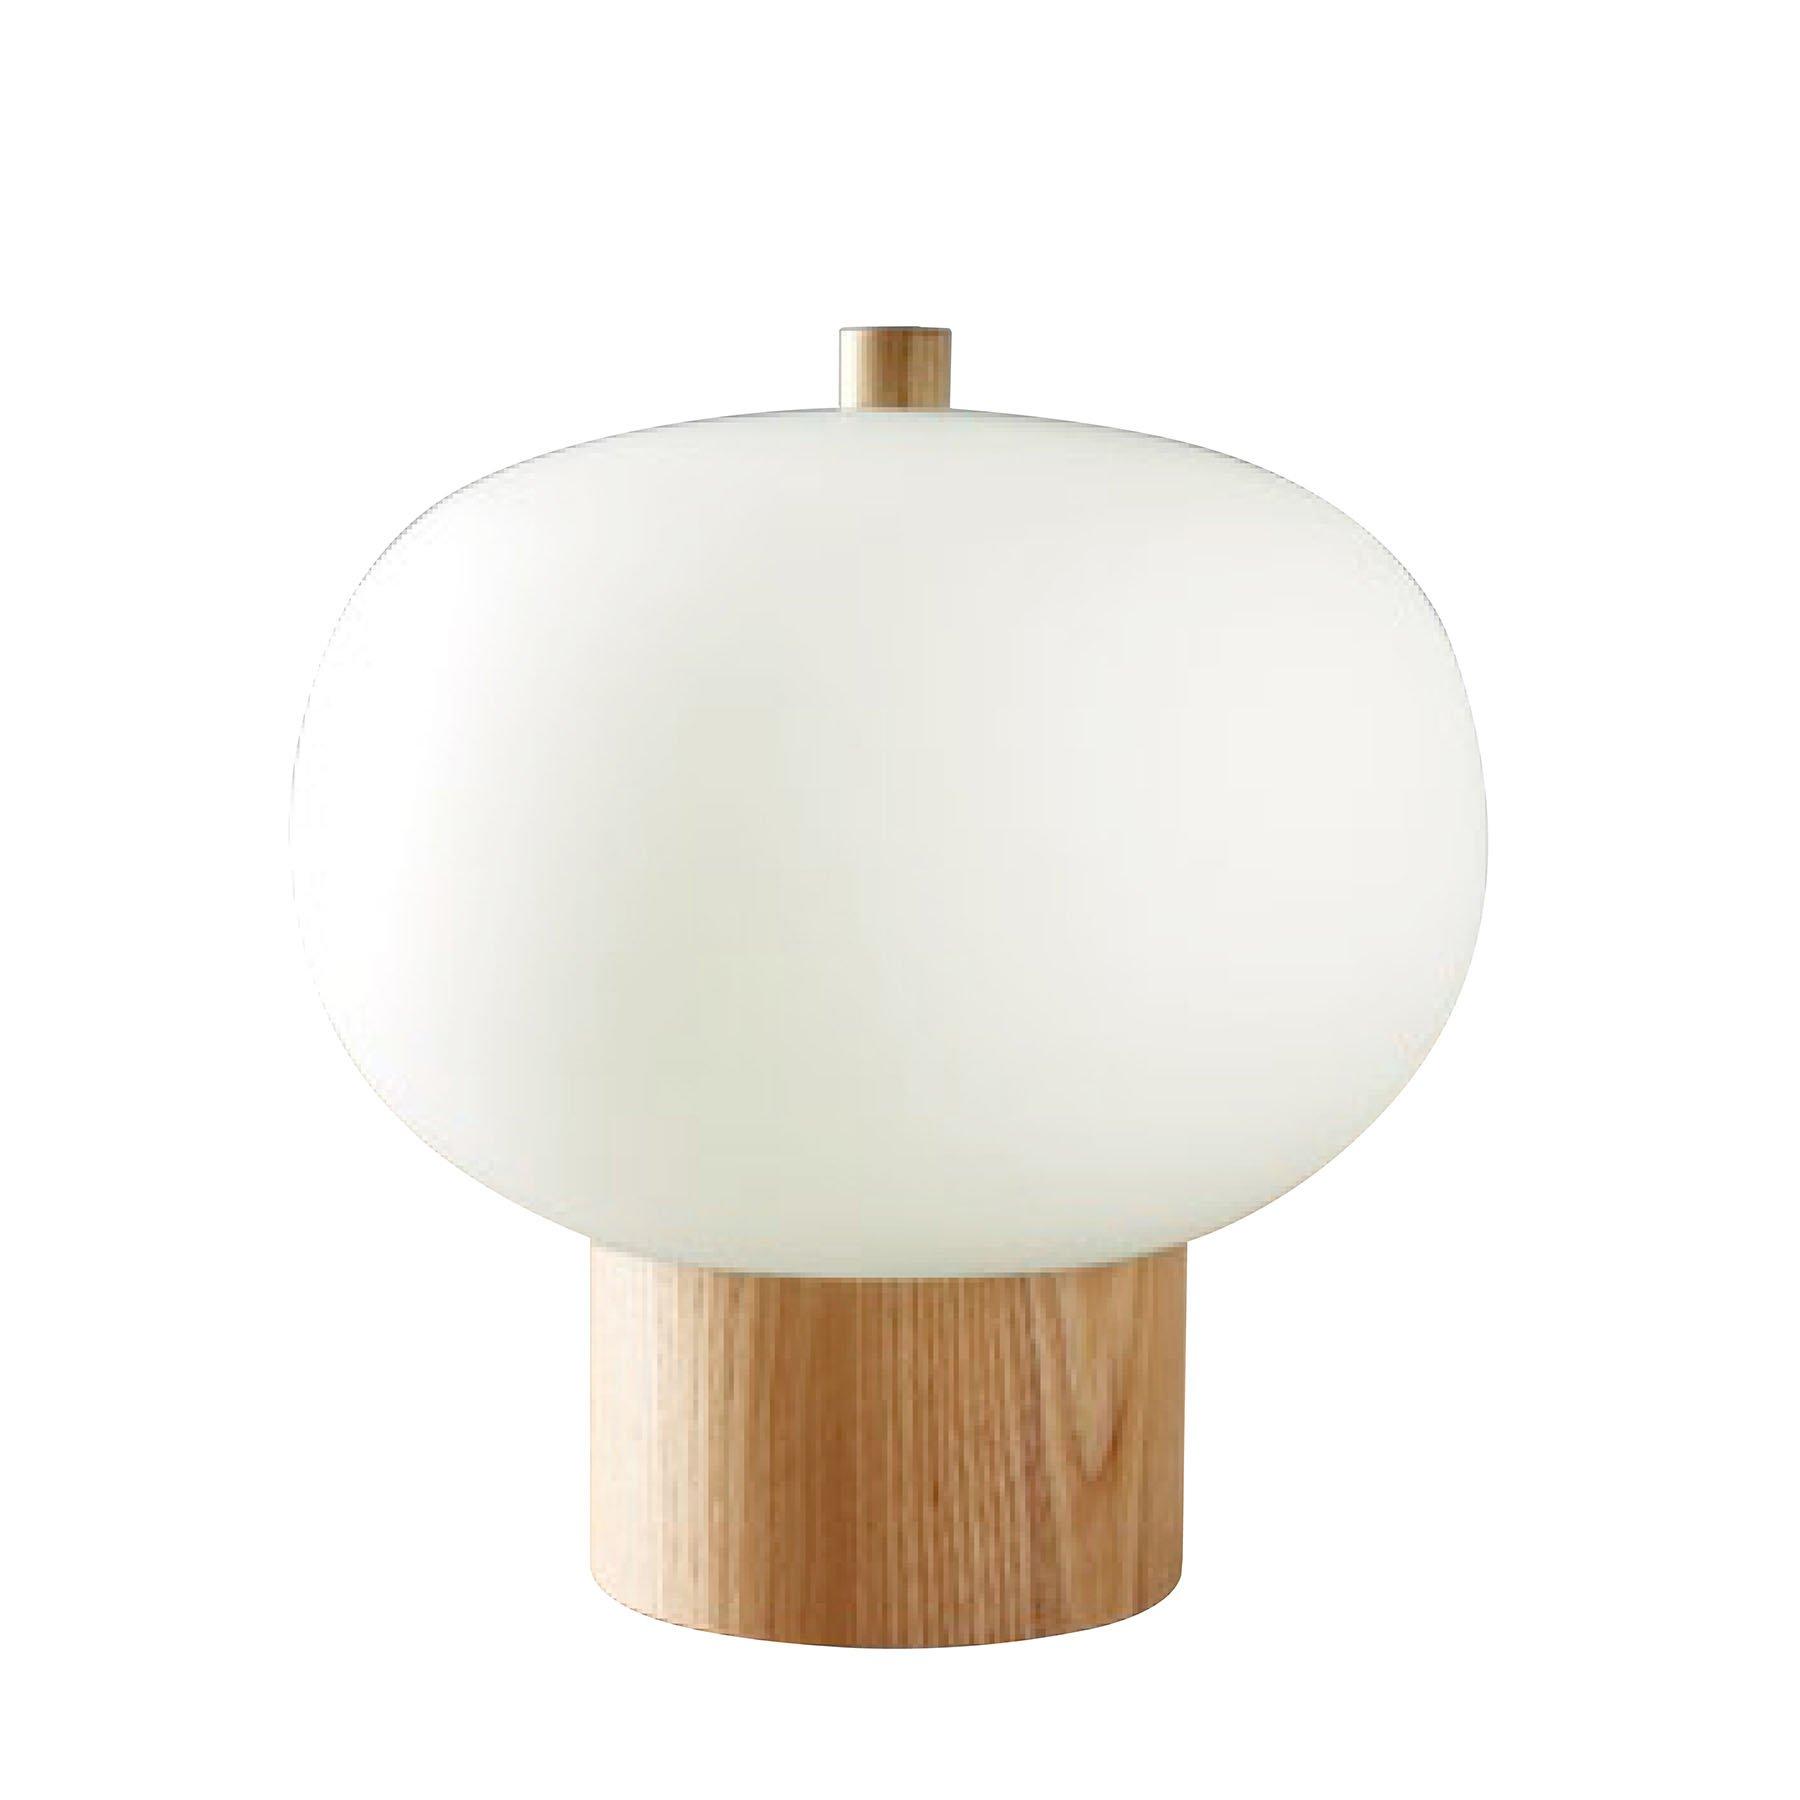 Grok Ilargi LED-bordlampe lys Ø 24cm touchdimmer